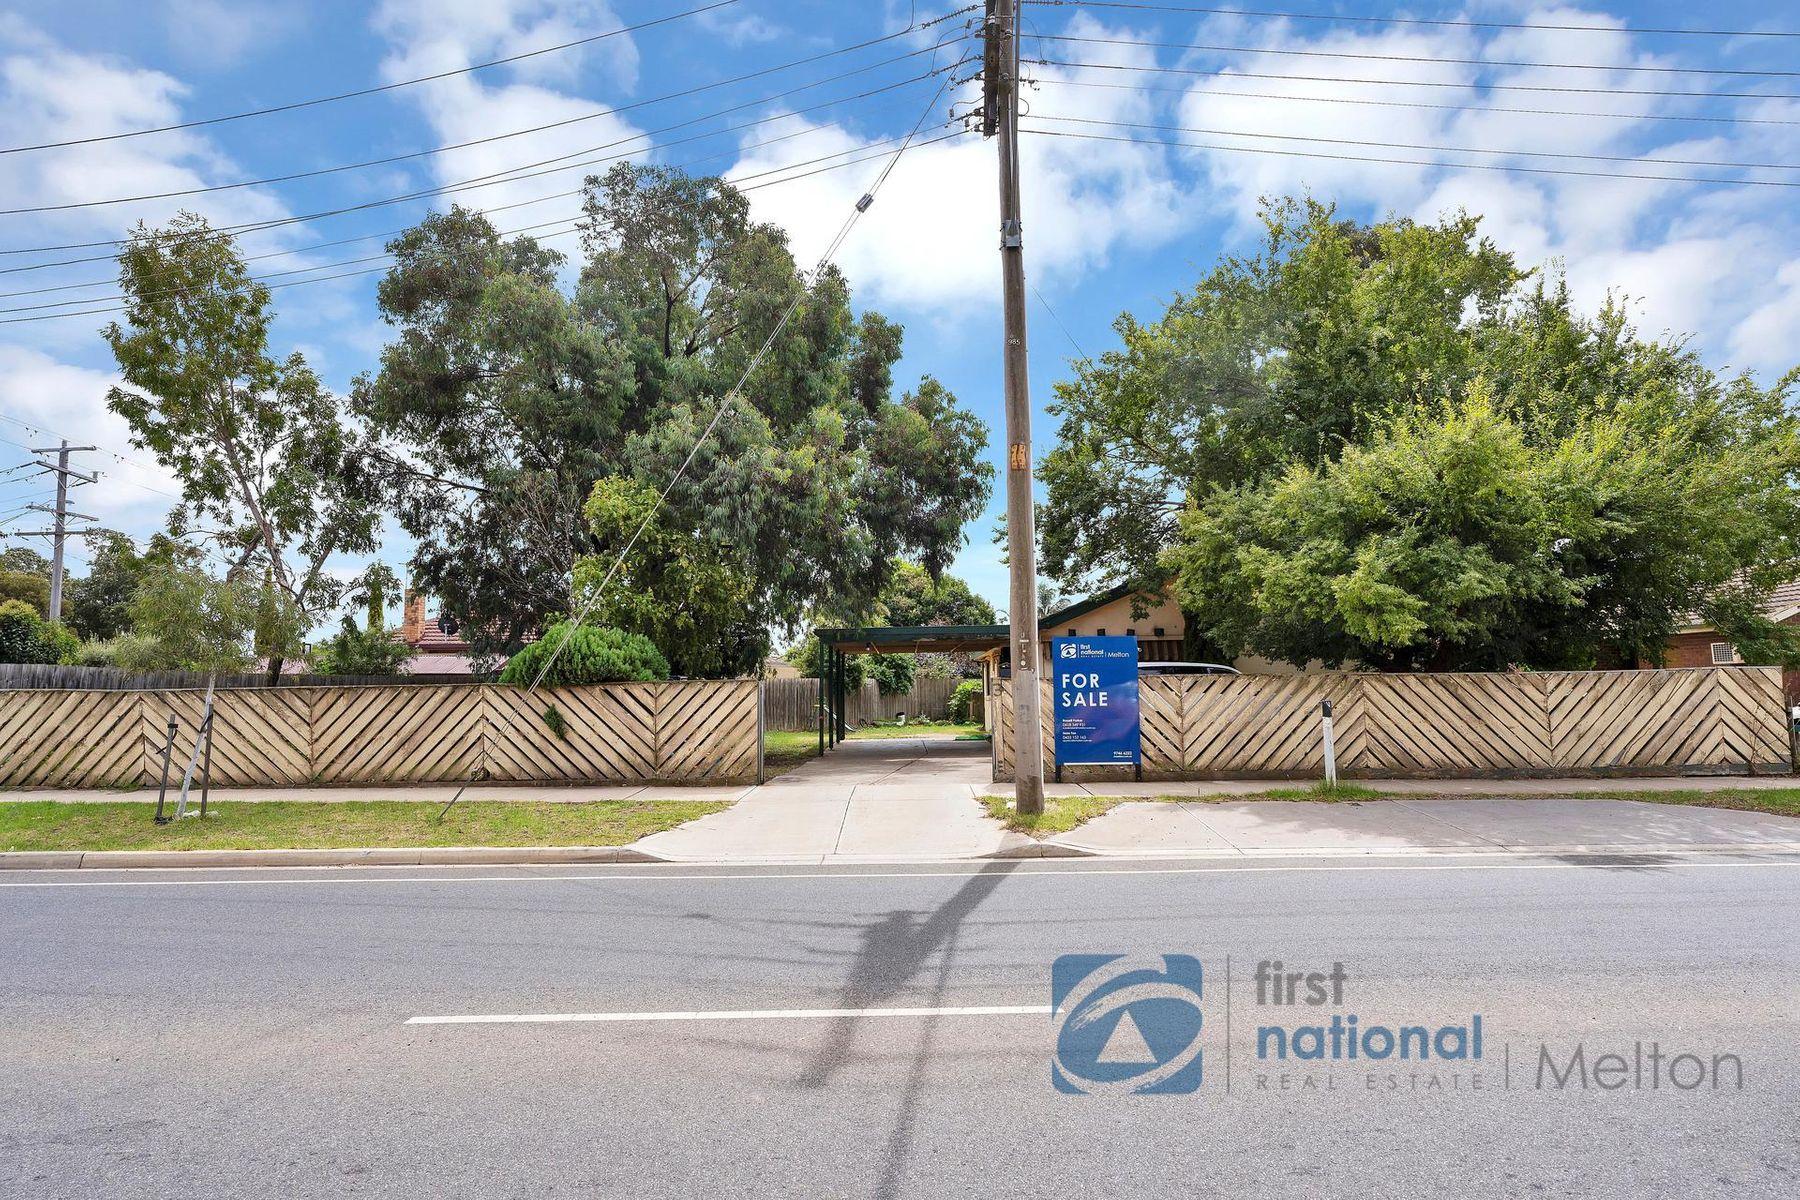 3 Bridge Road, Melton South, VIC 3338